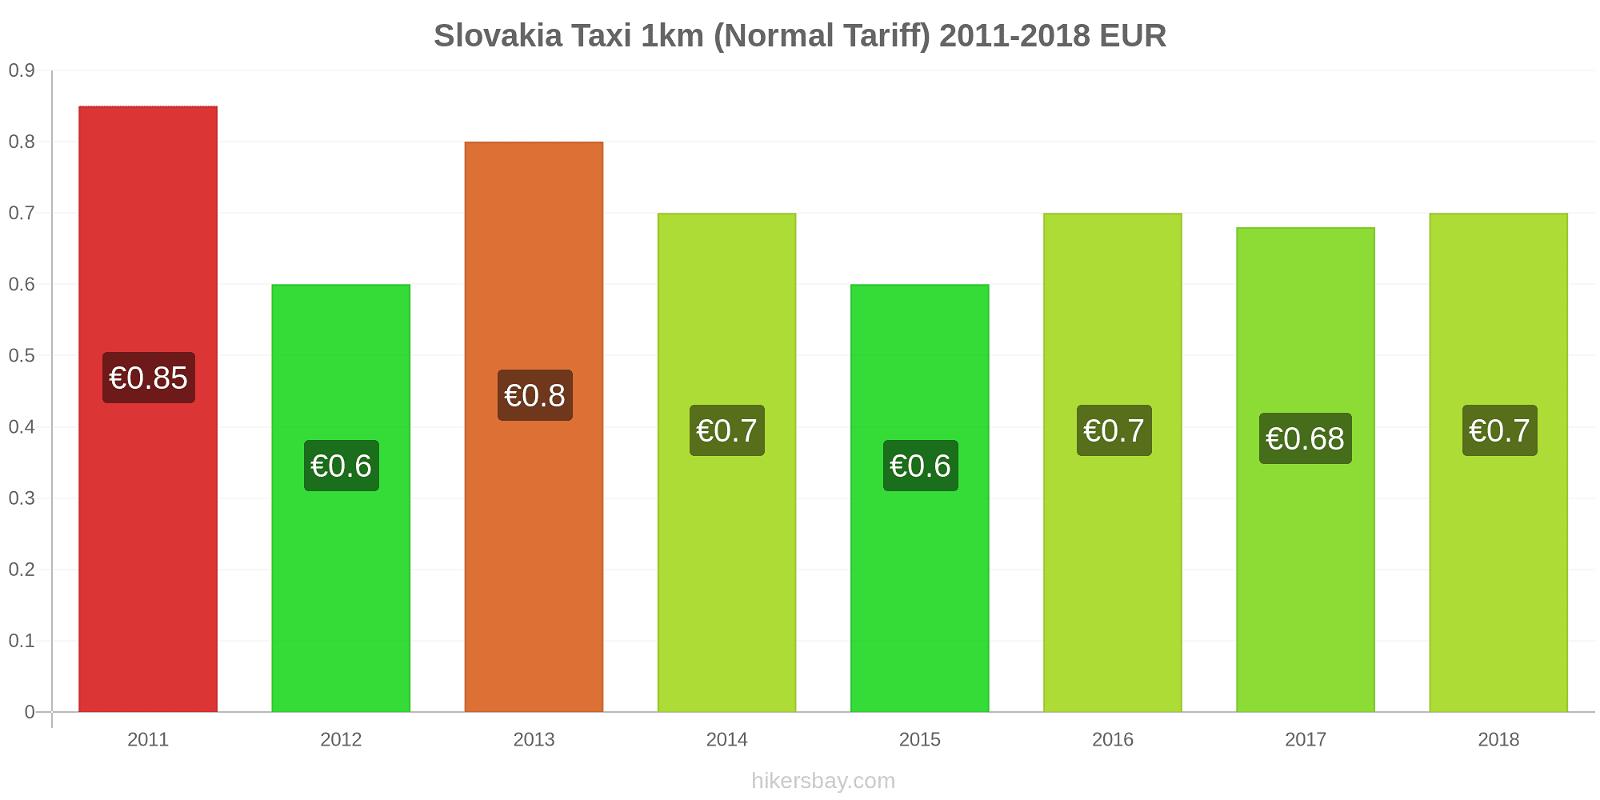 Slovakia price changes Taxi 1km (Normal Tariff) hikersbay.com